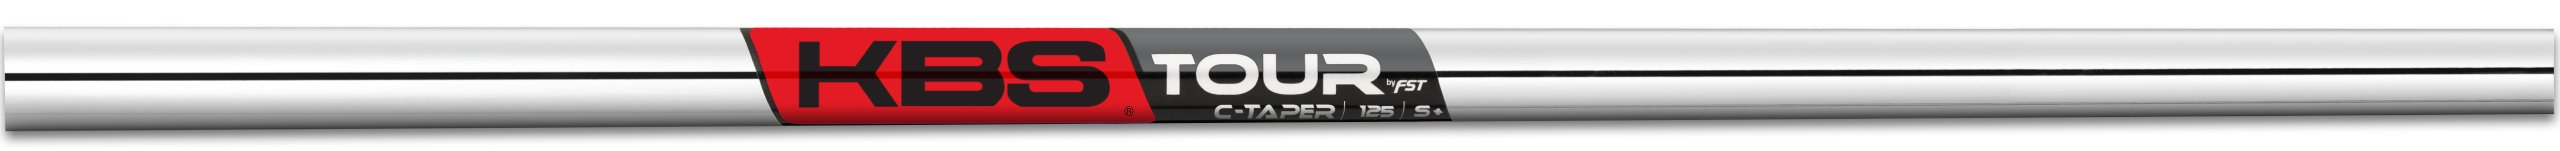 True Temper Men's C-Taper S+ Golf Club Shaft, 125gm, Steel, Stiff, 4-PW